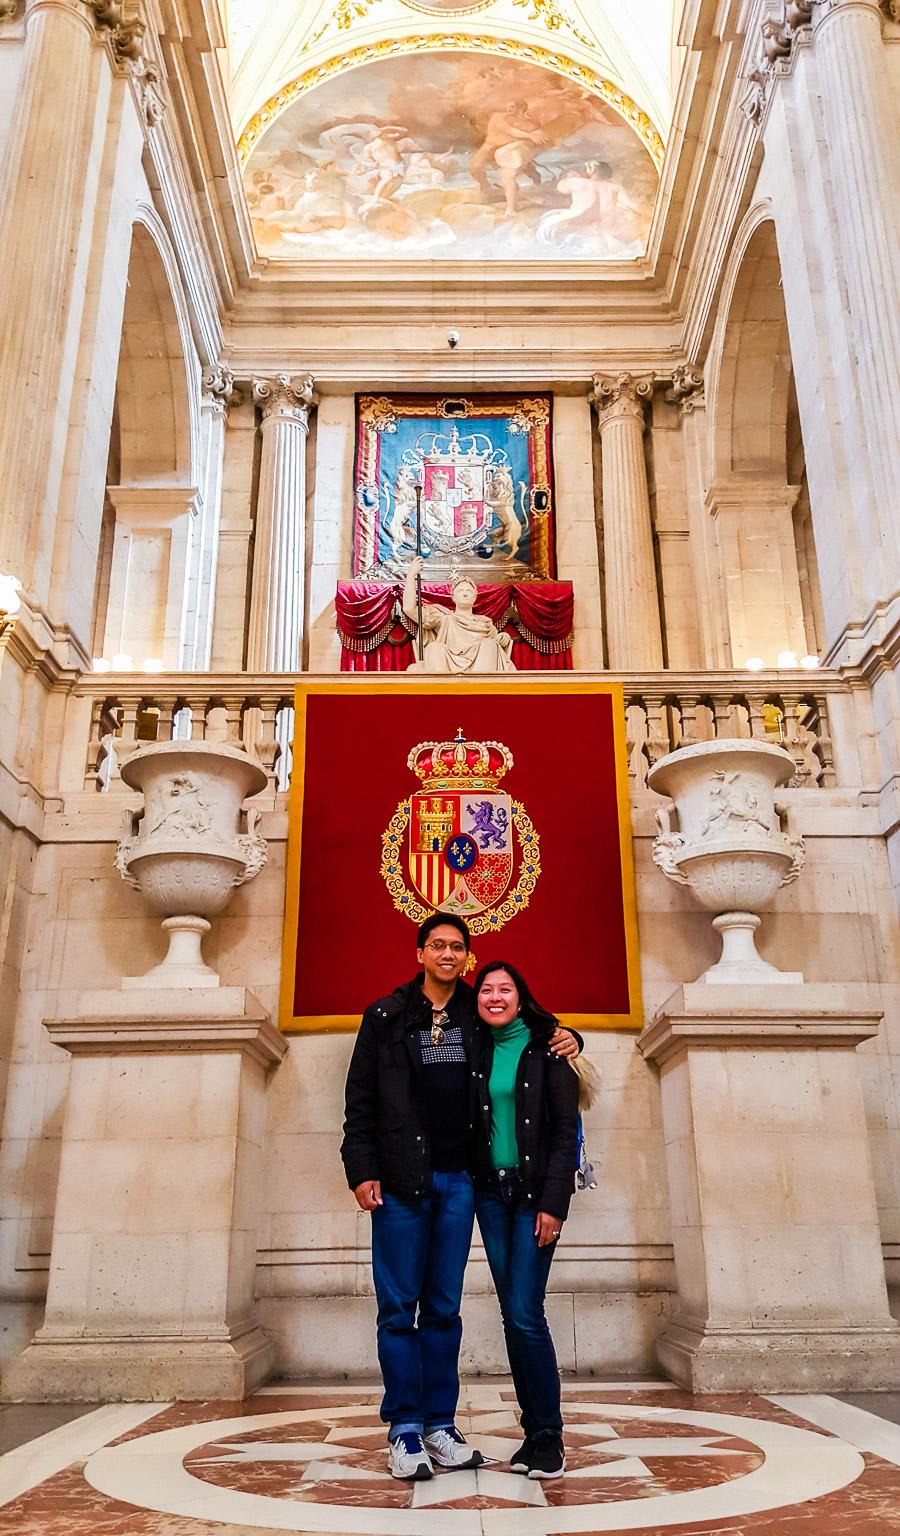 Palacio Real (Madrid, Spain)